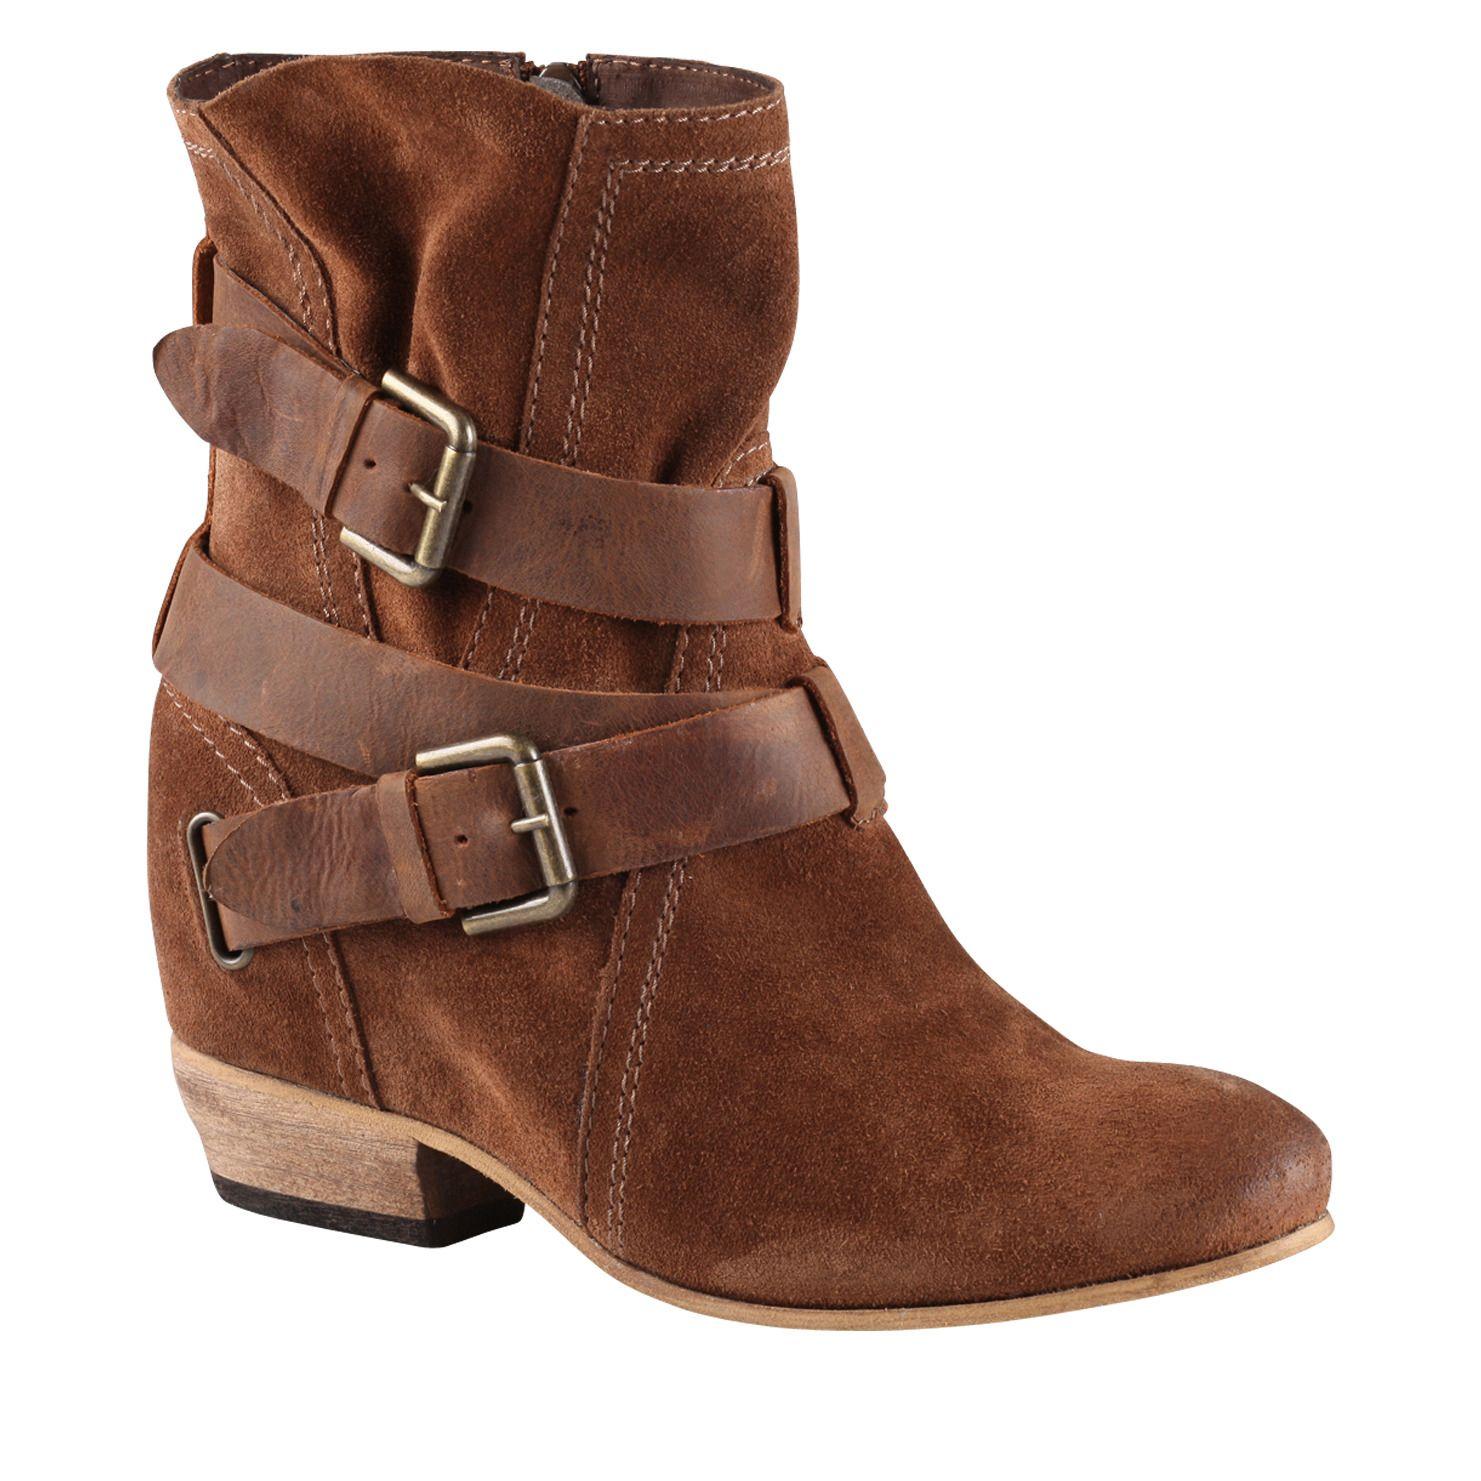 aldo shoes canada boots women